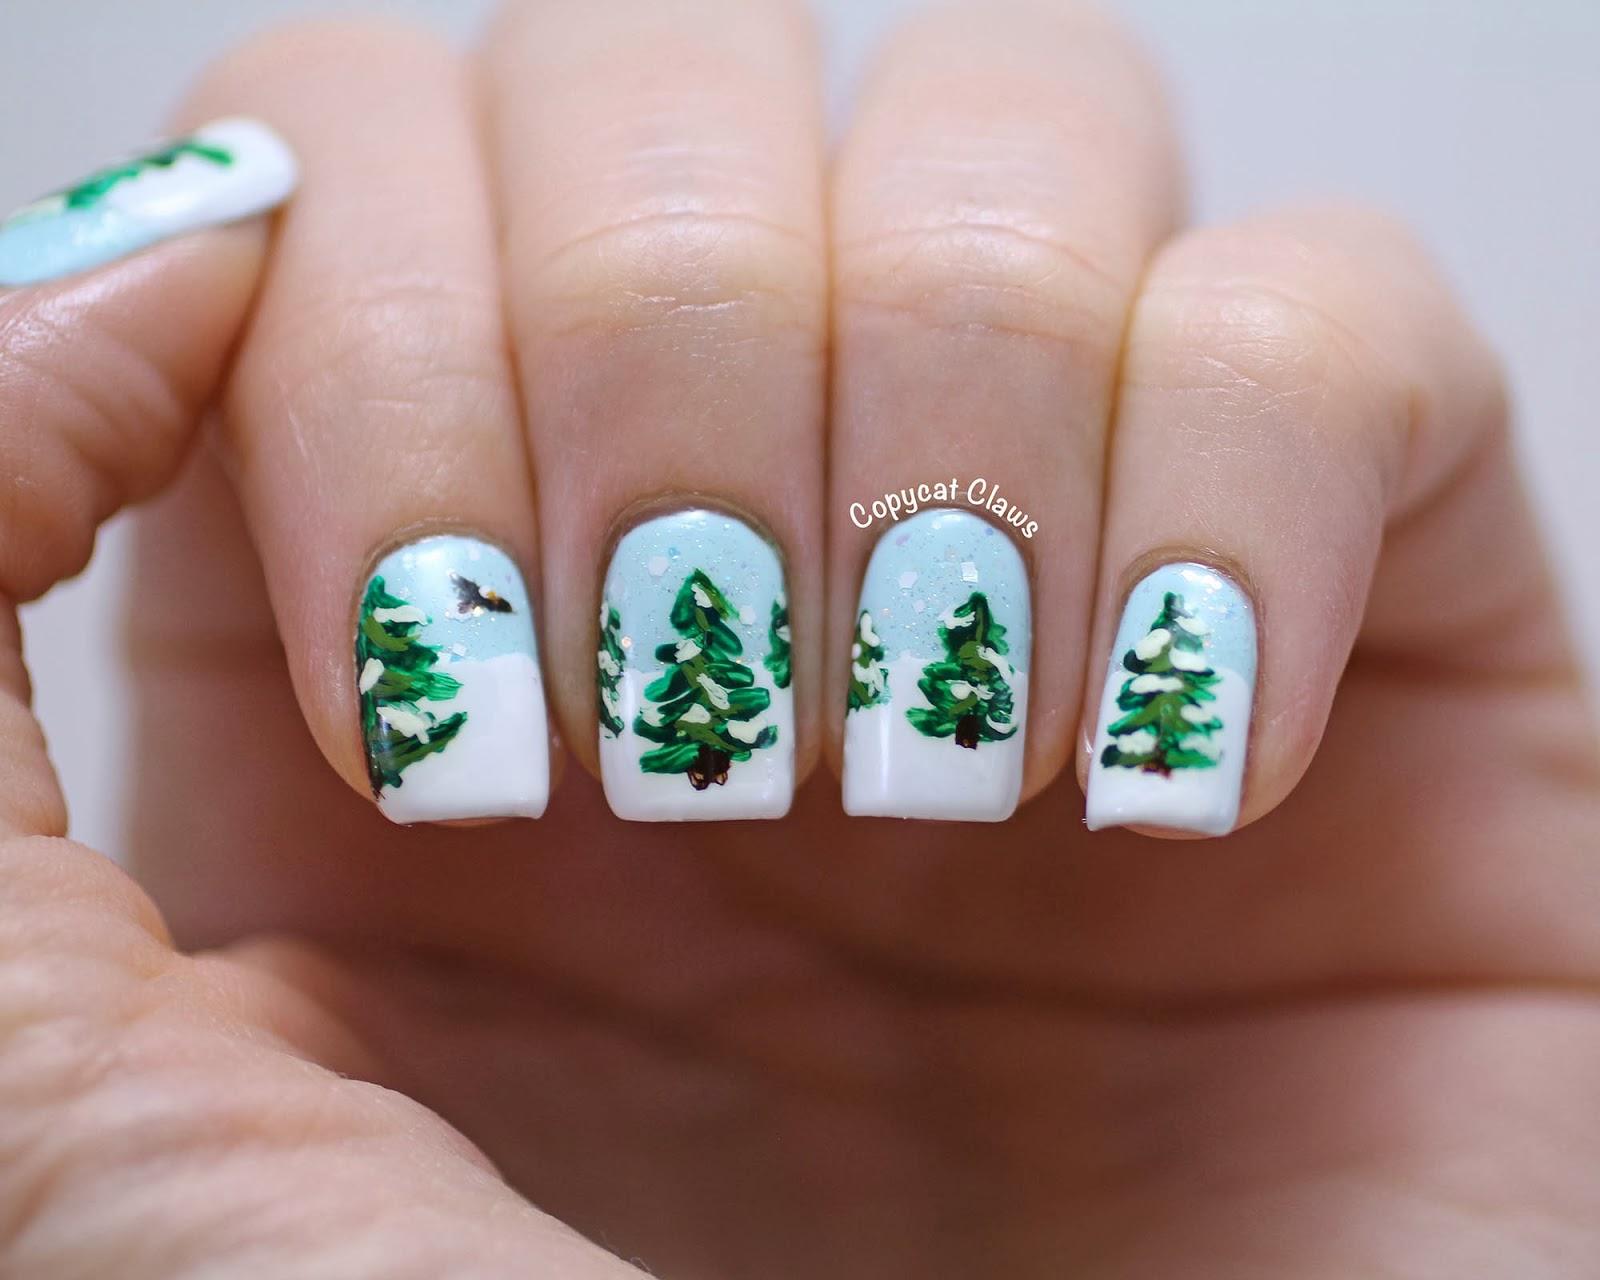 copycat claws winter wonderland nail art. Black Bedroom Furniture Sets. Home Design Ideas